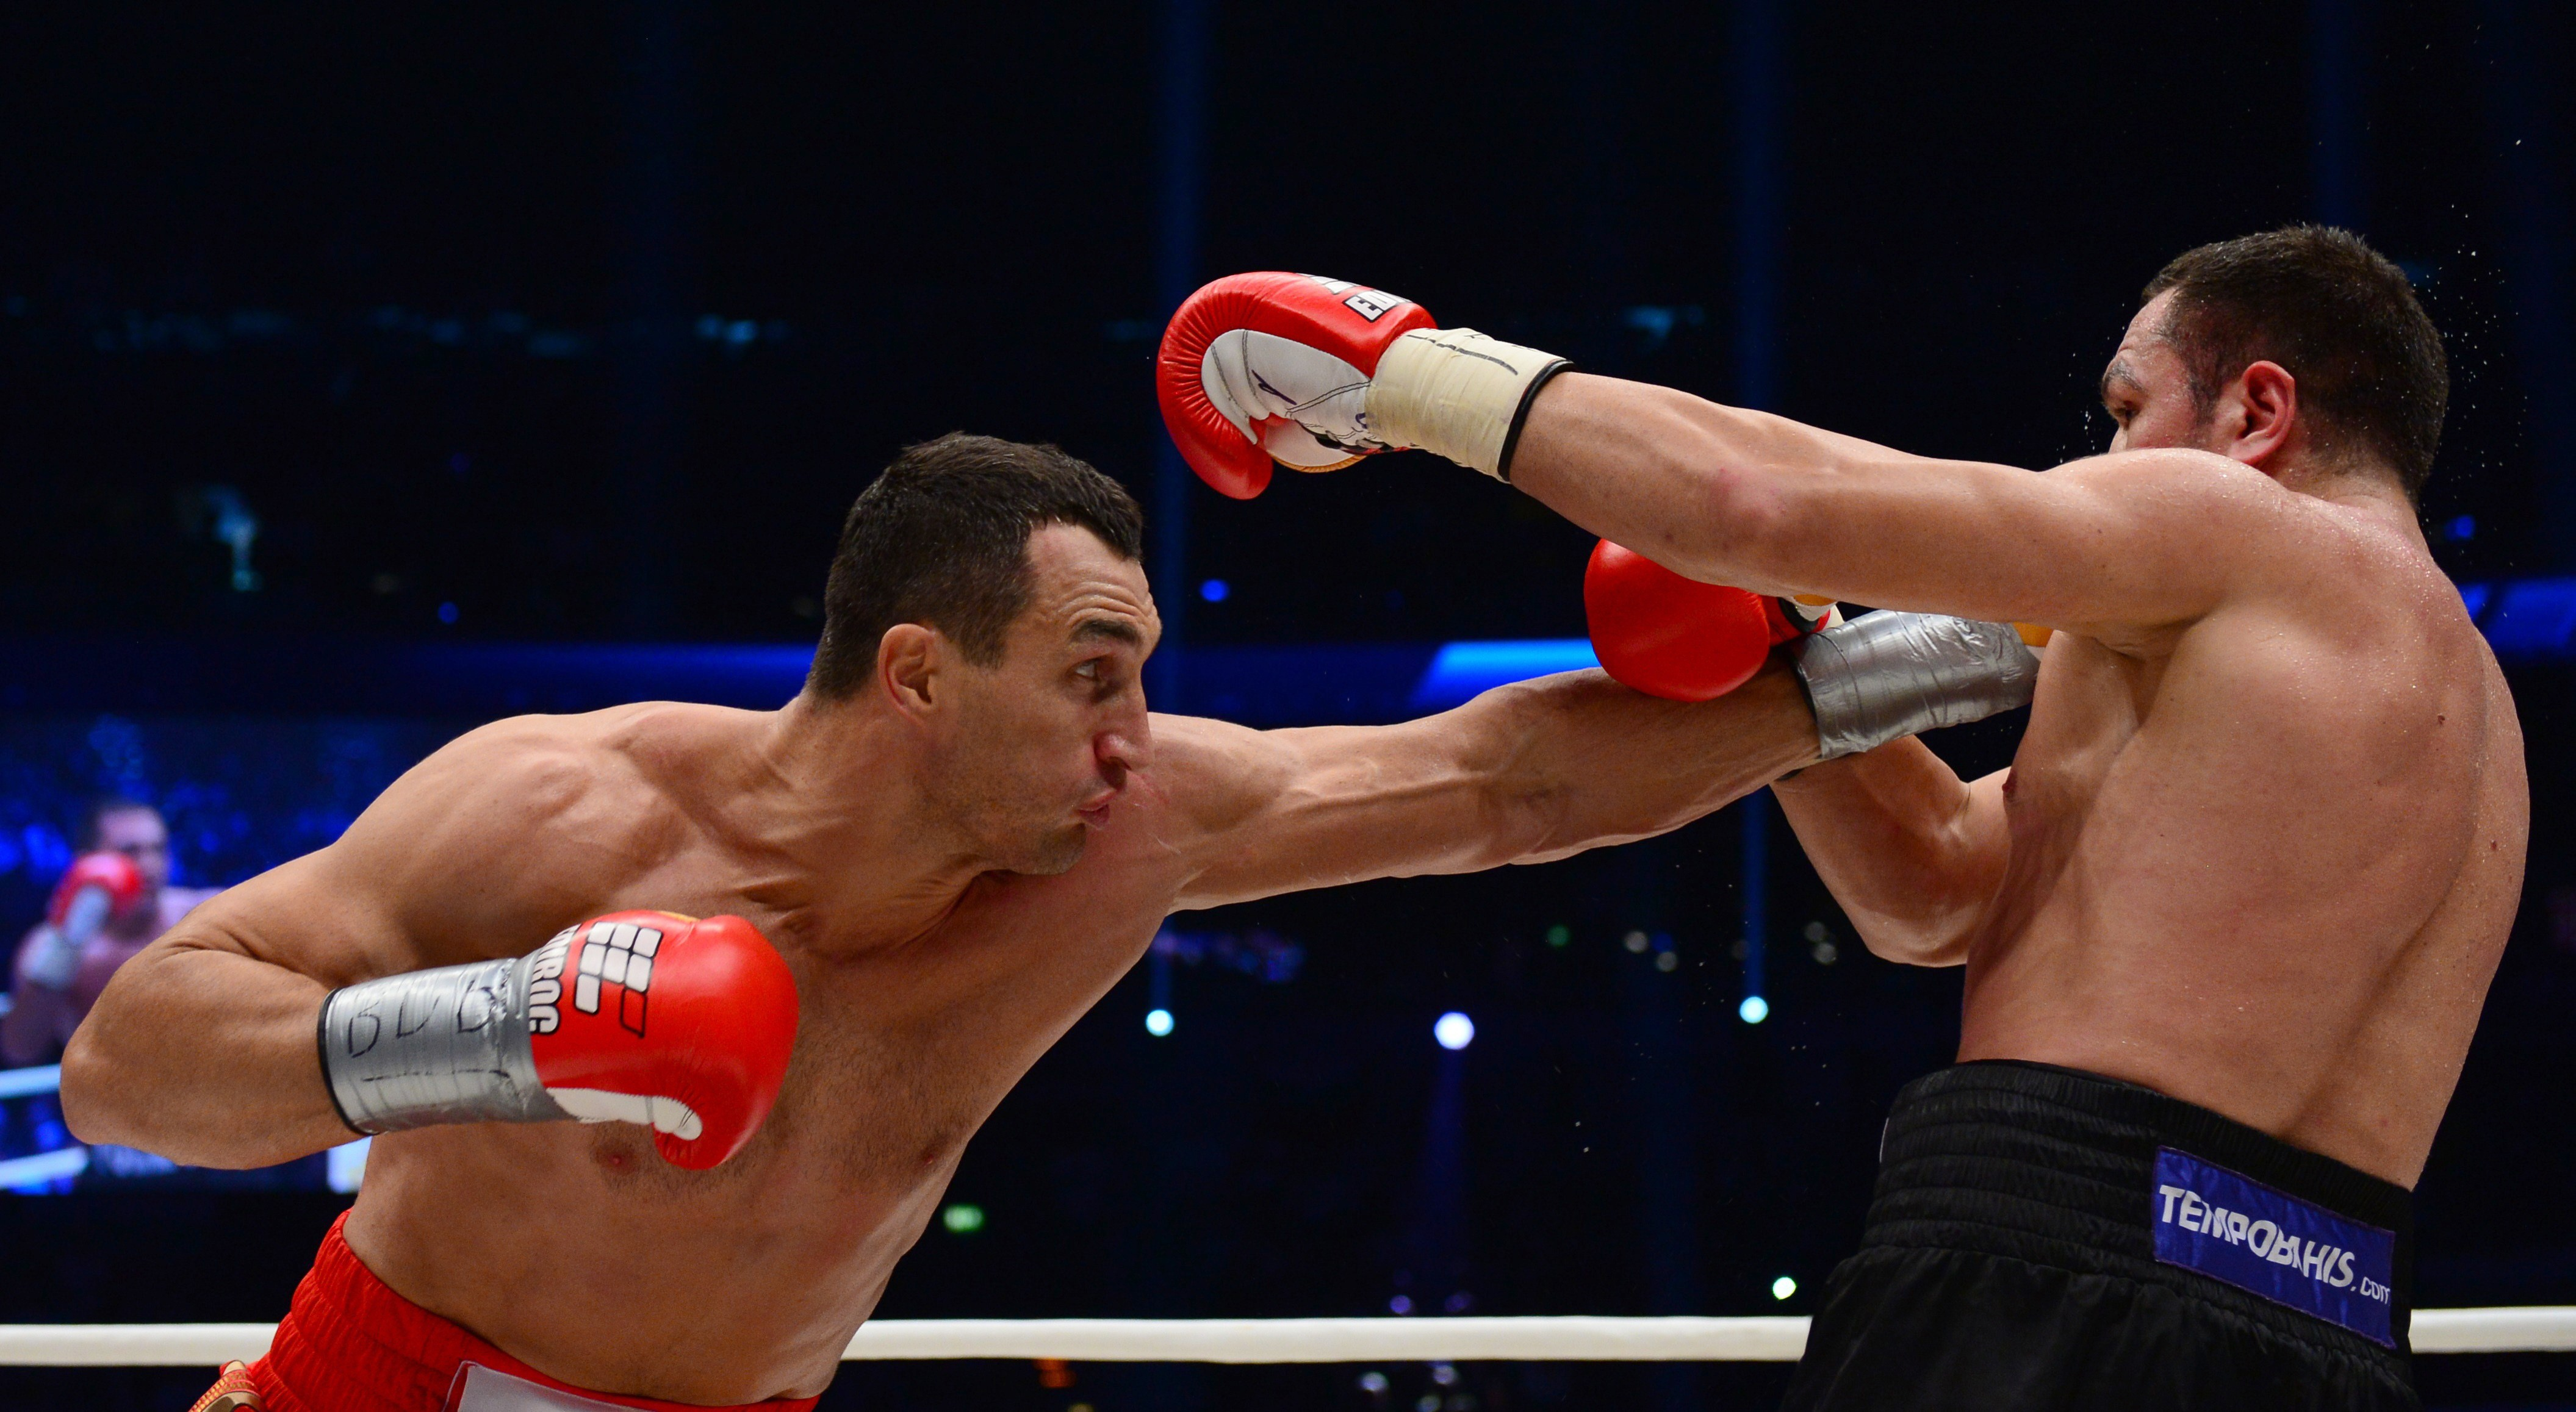 Bulgarian Kubrat Pulev eats a stiff jabs from Wladimir Klitschko (Getty)